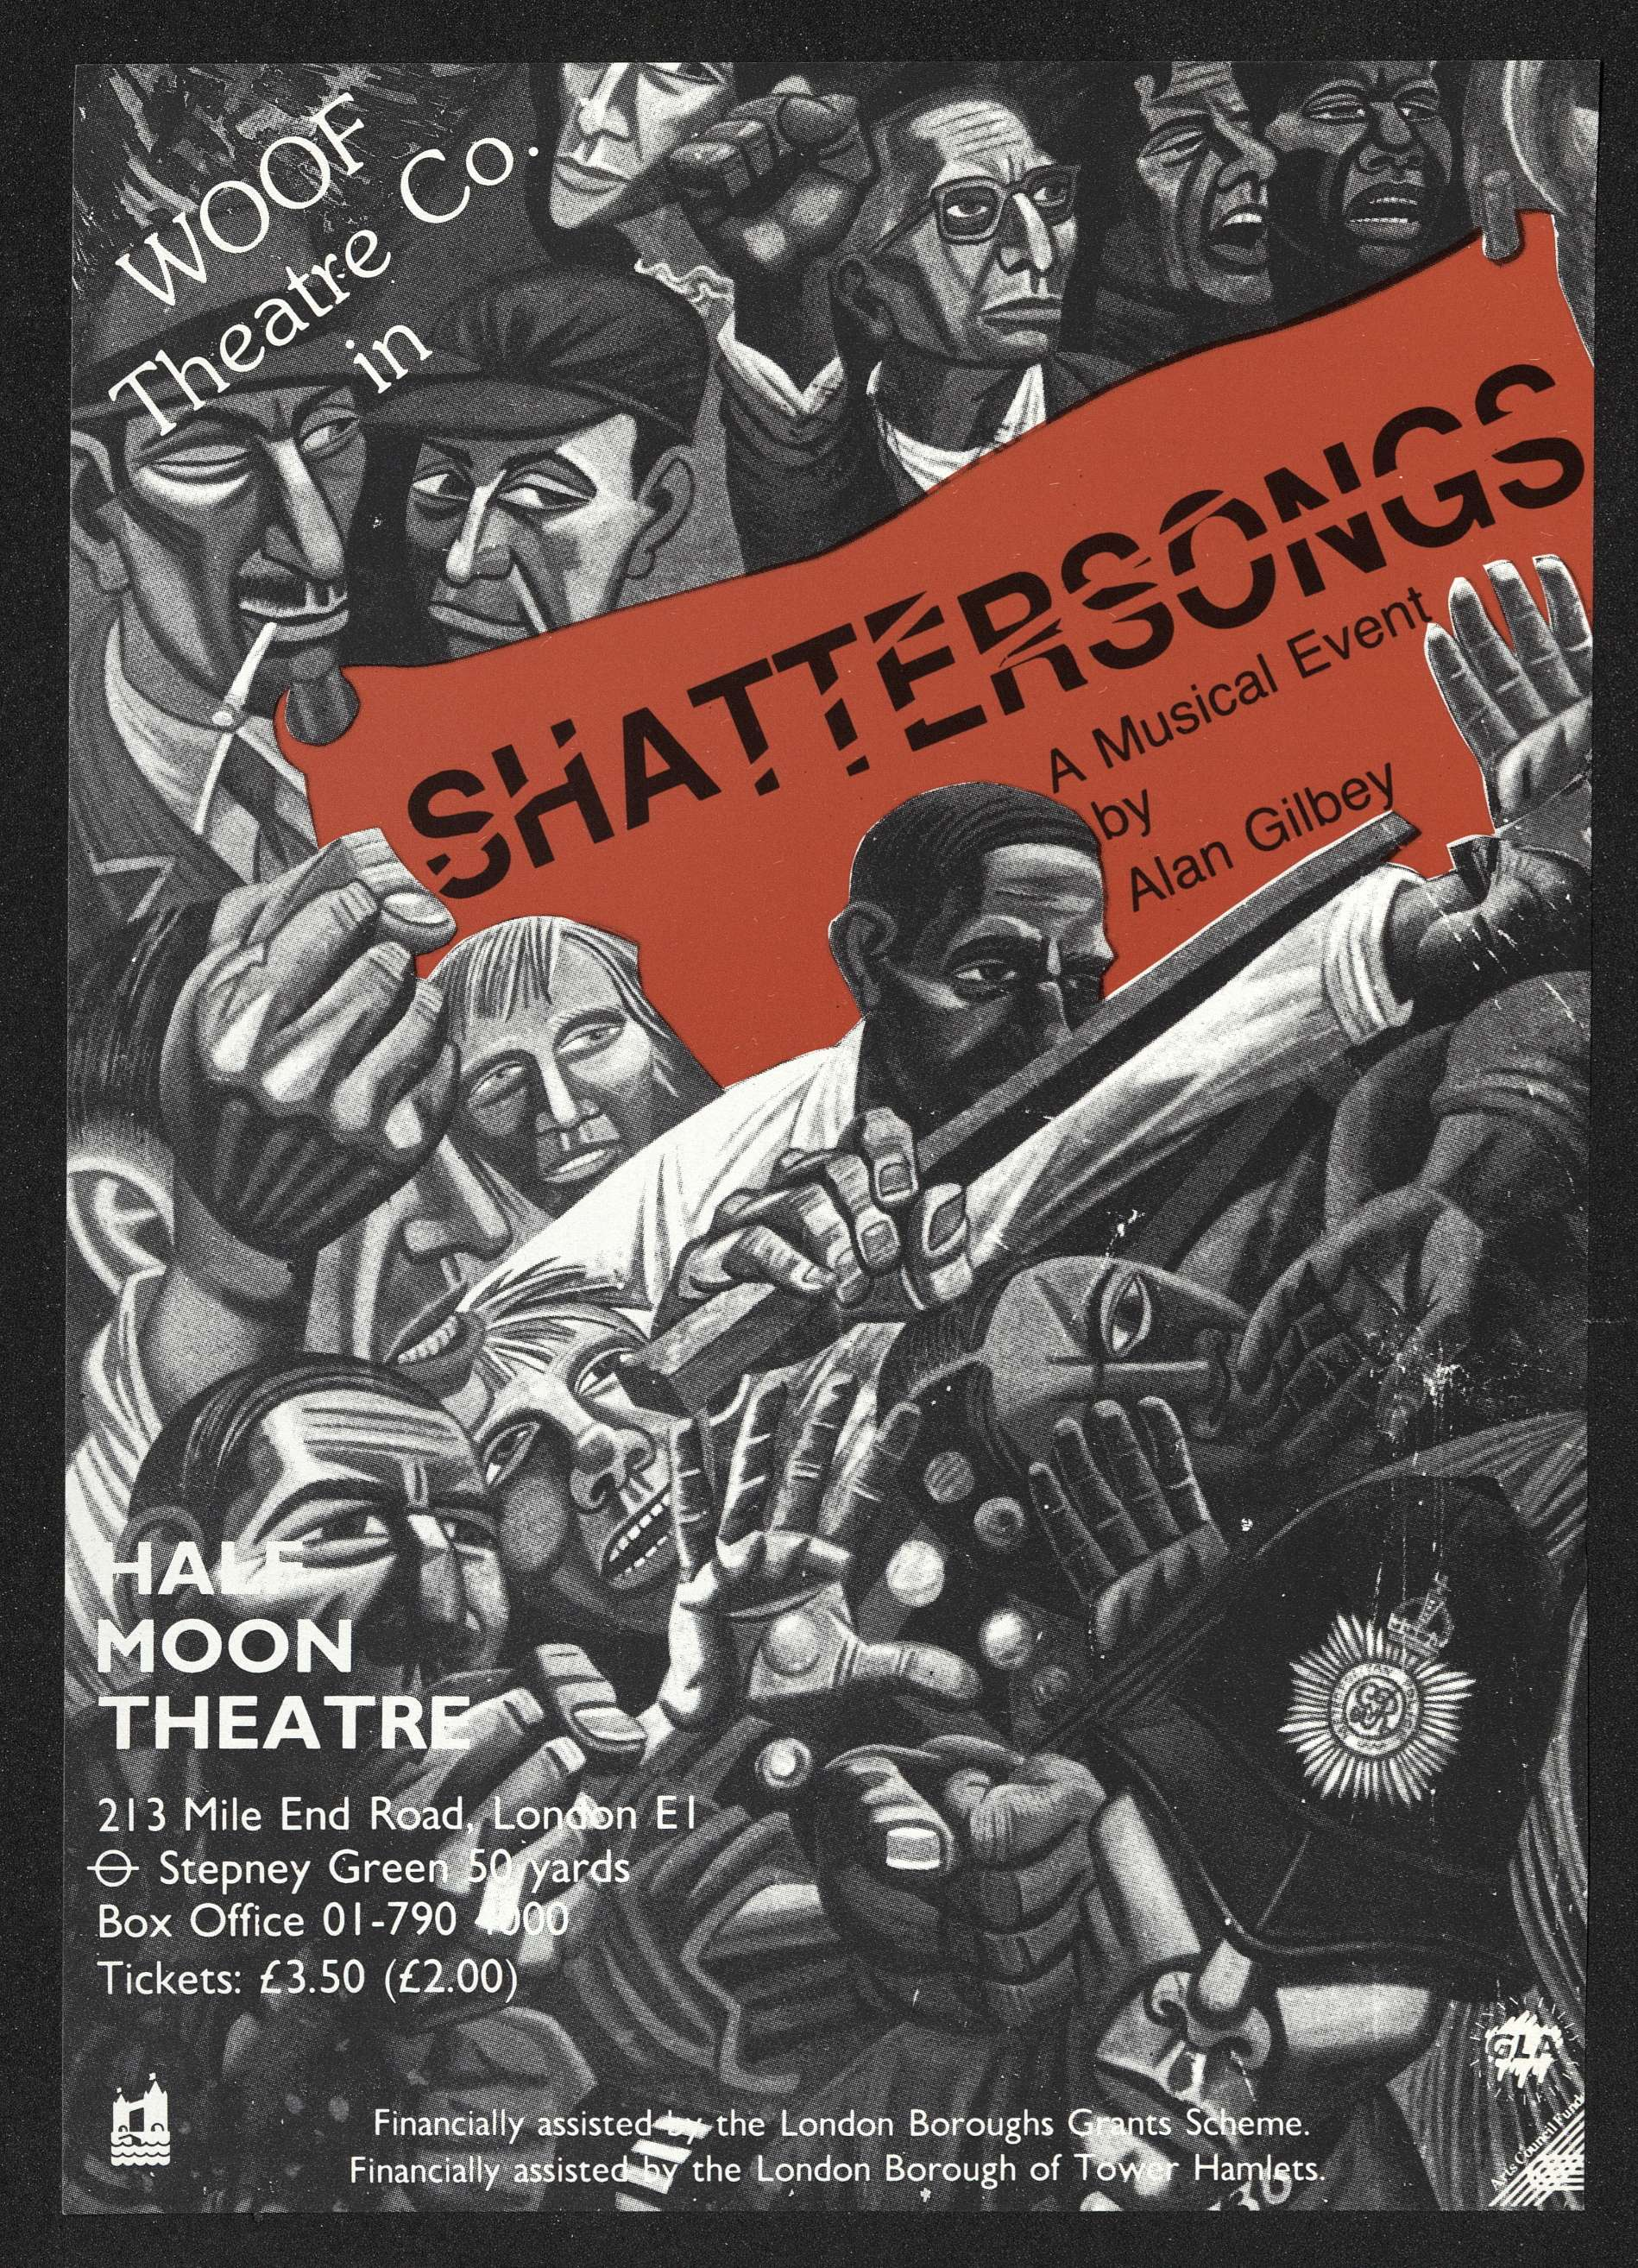 Shattersongs Flyer (1)